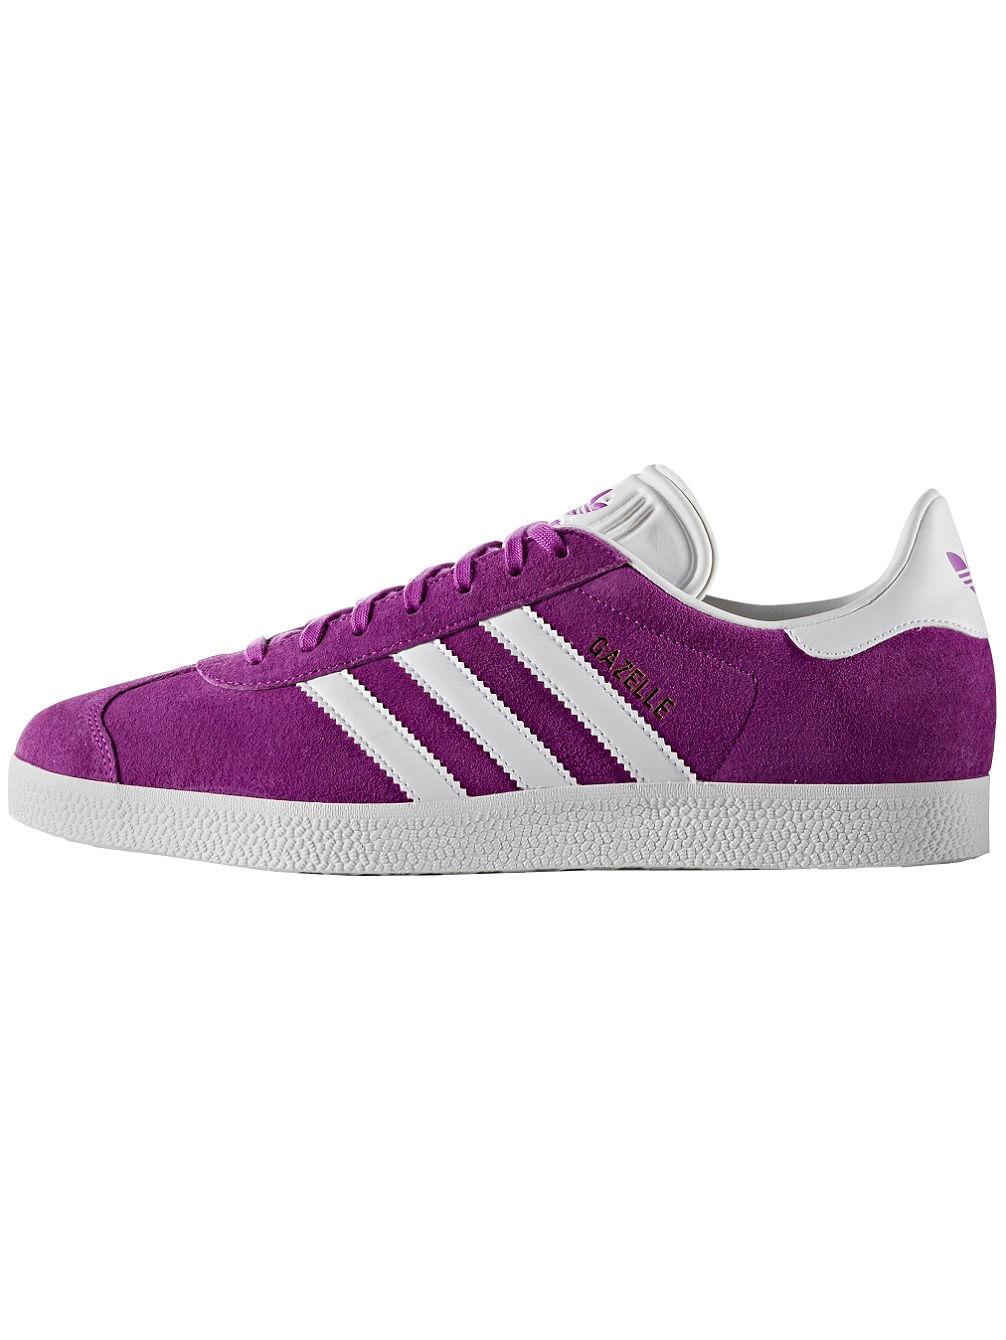 adidas-originals-gazelle-sneakers-women